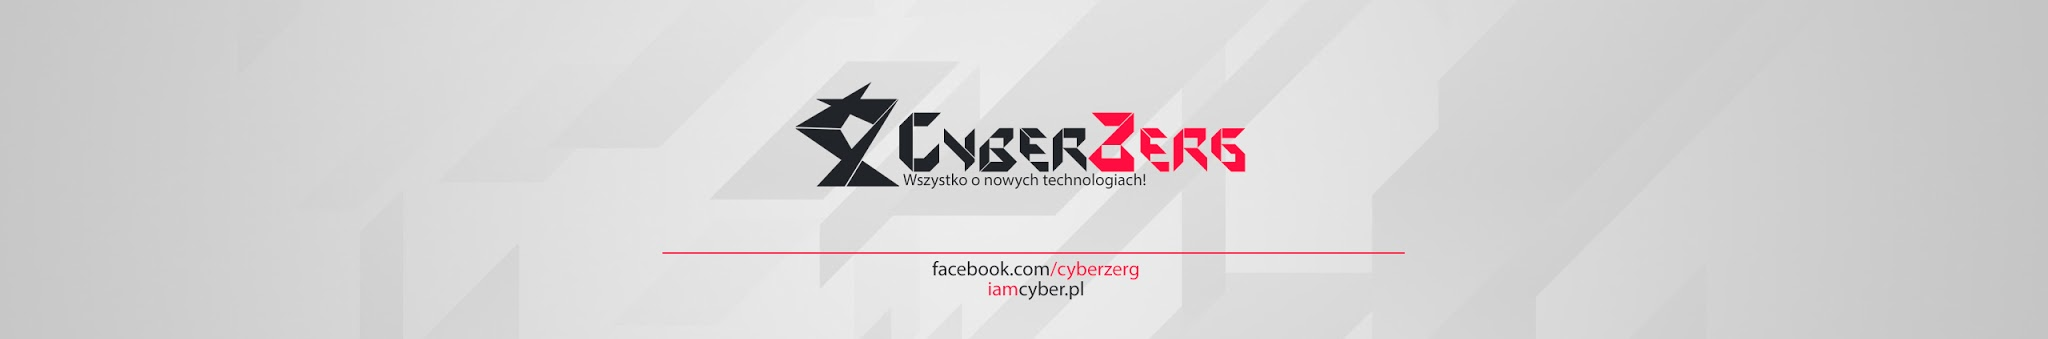 CyberZerg